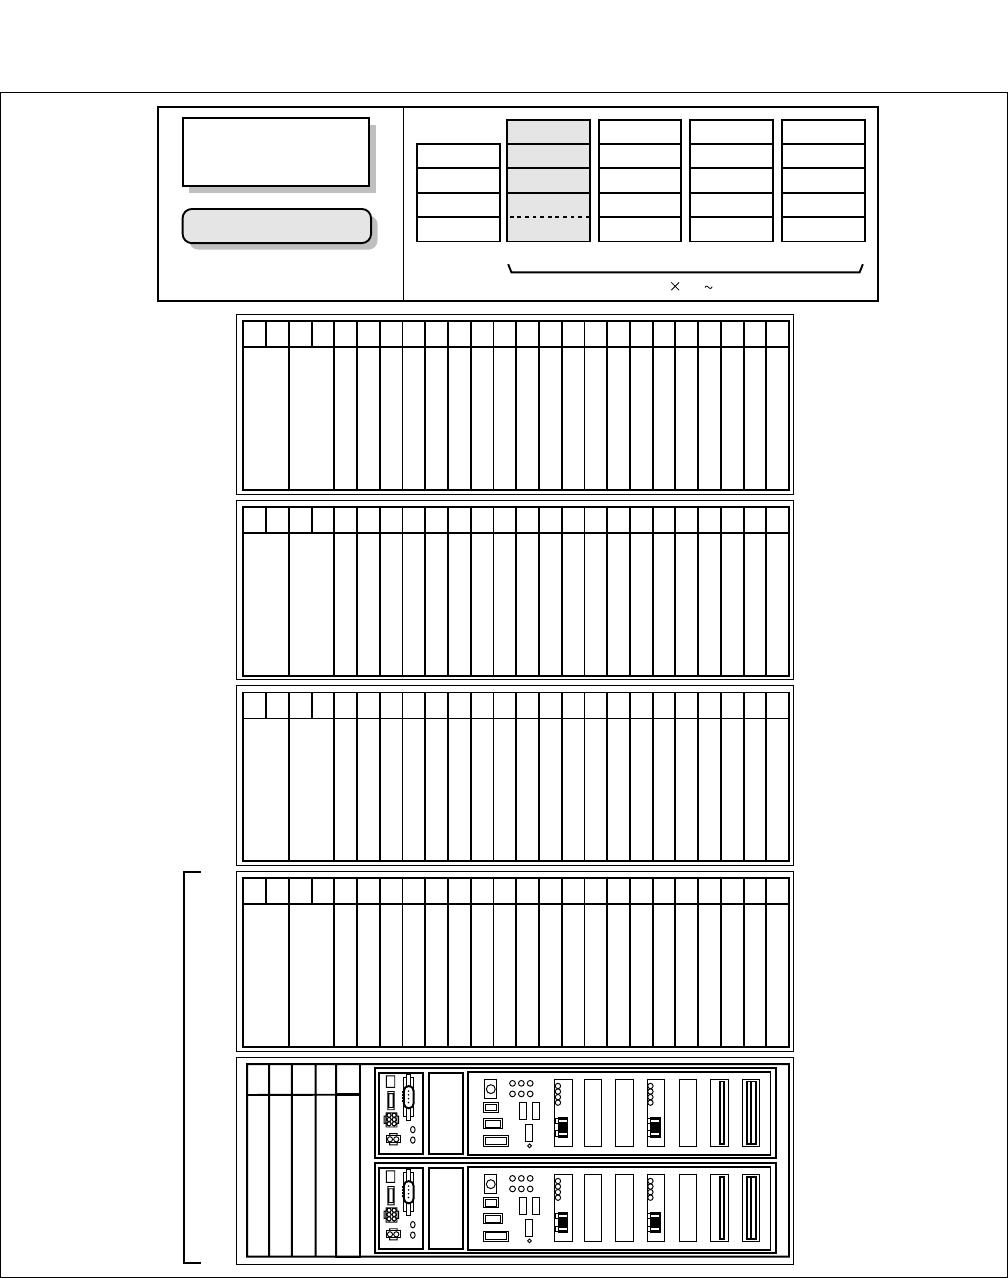 Nec 2400 Ipx Users Manual NEAX2400 Circuit Card